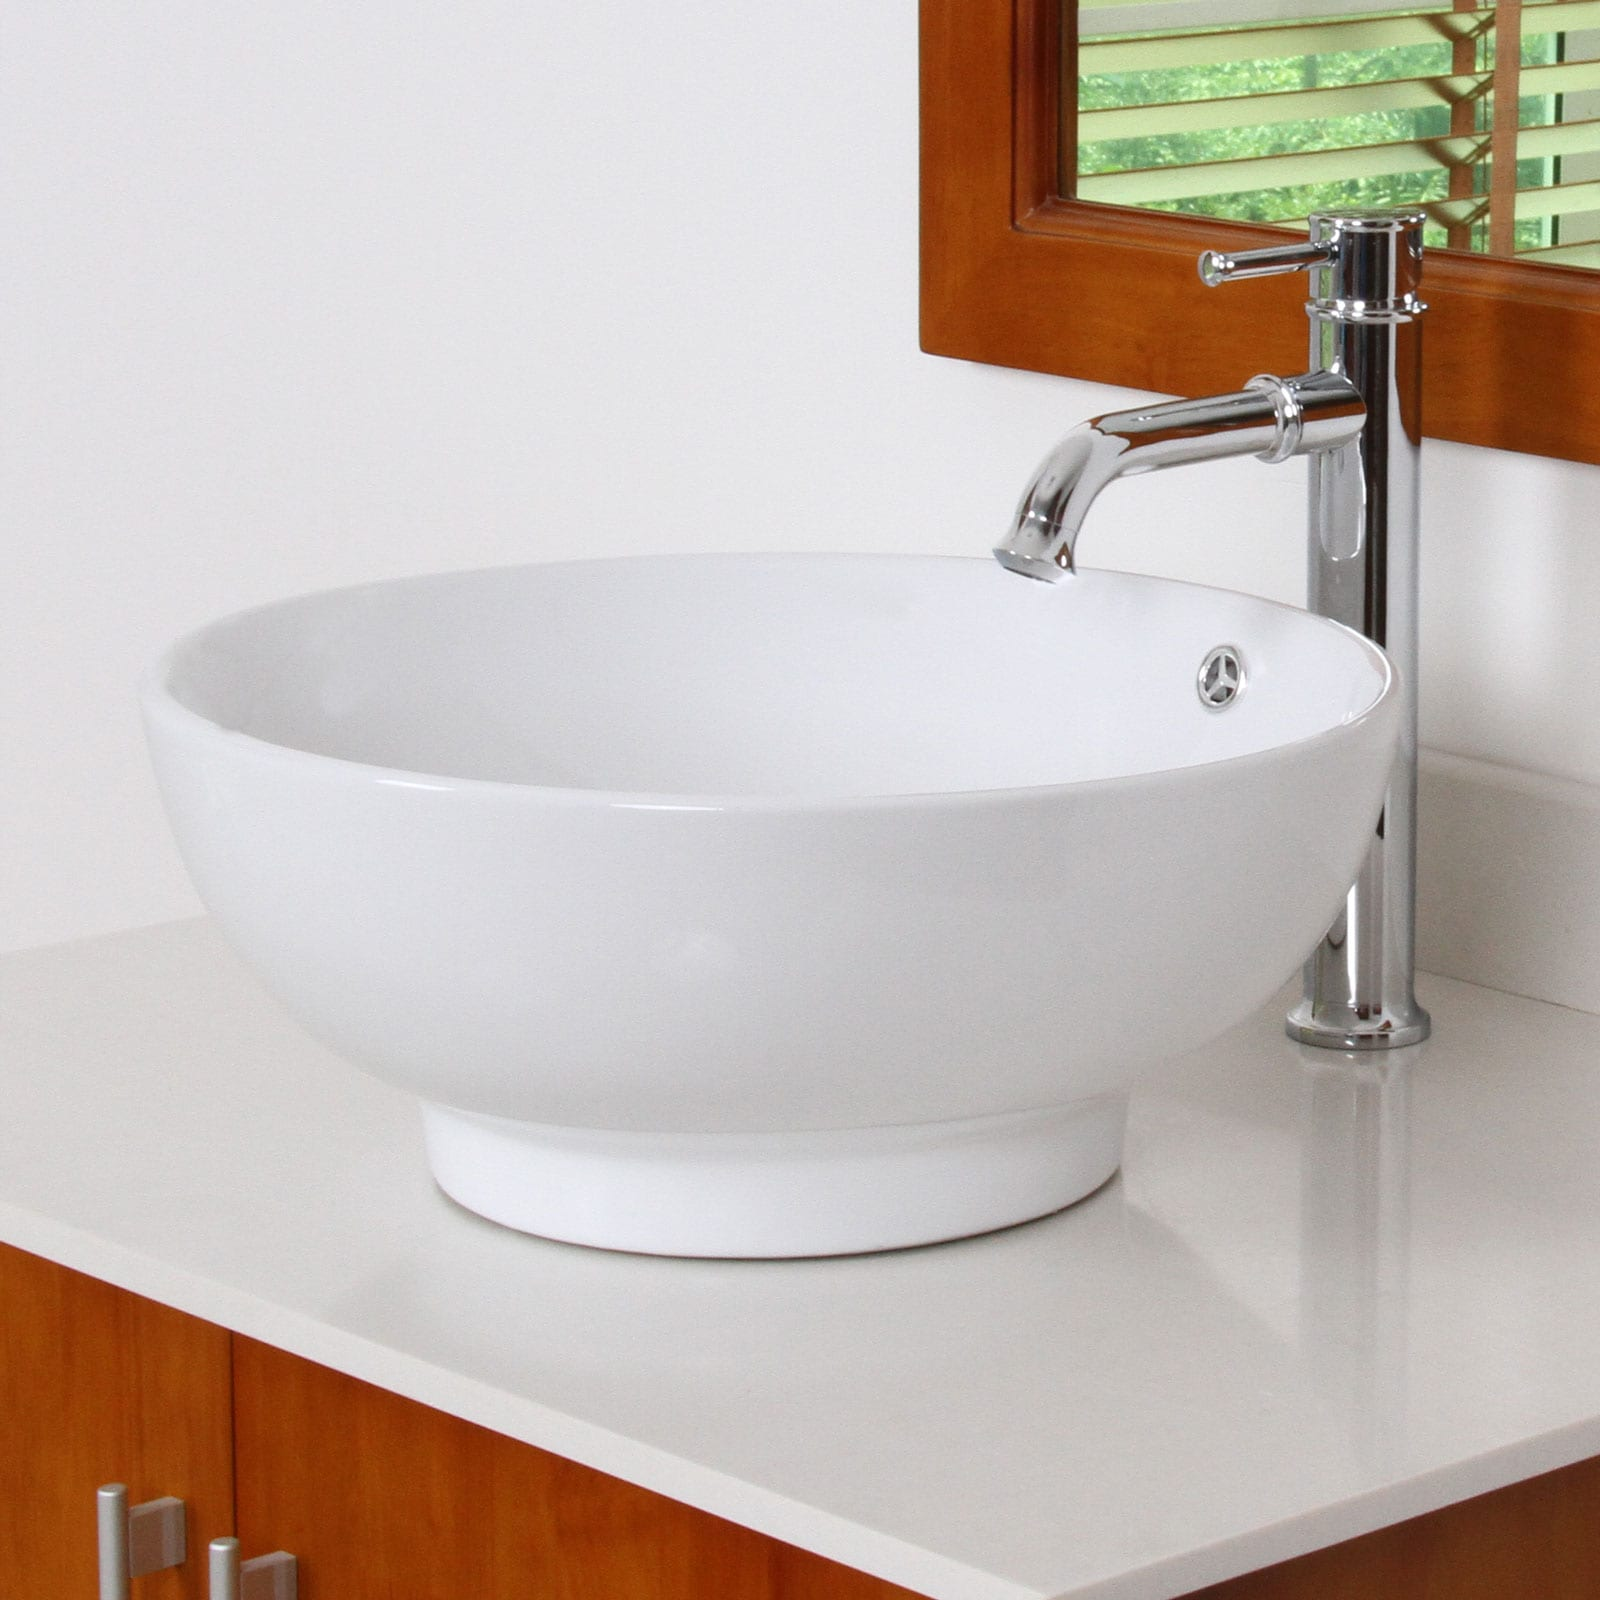 ELITE 9851F371067C High Temperature Grade A Ceramic Bathroom Sink With Unique Round Design and Chrome Finish Faucet Combo